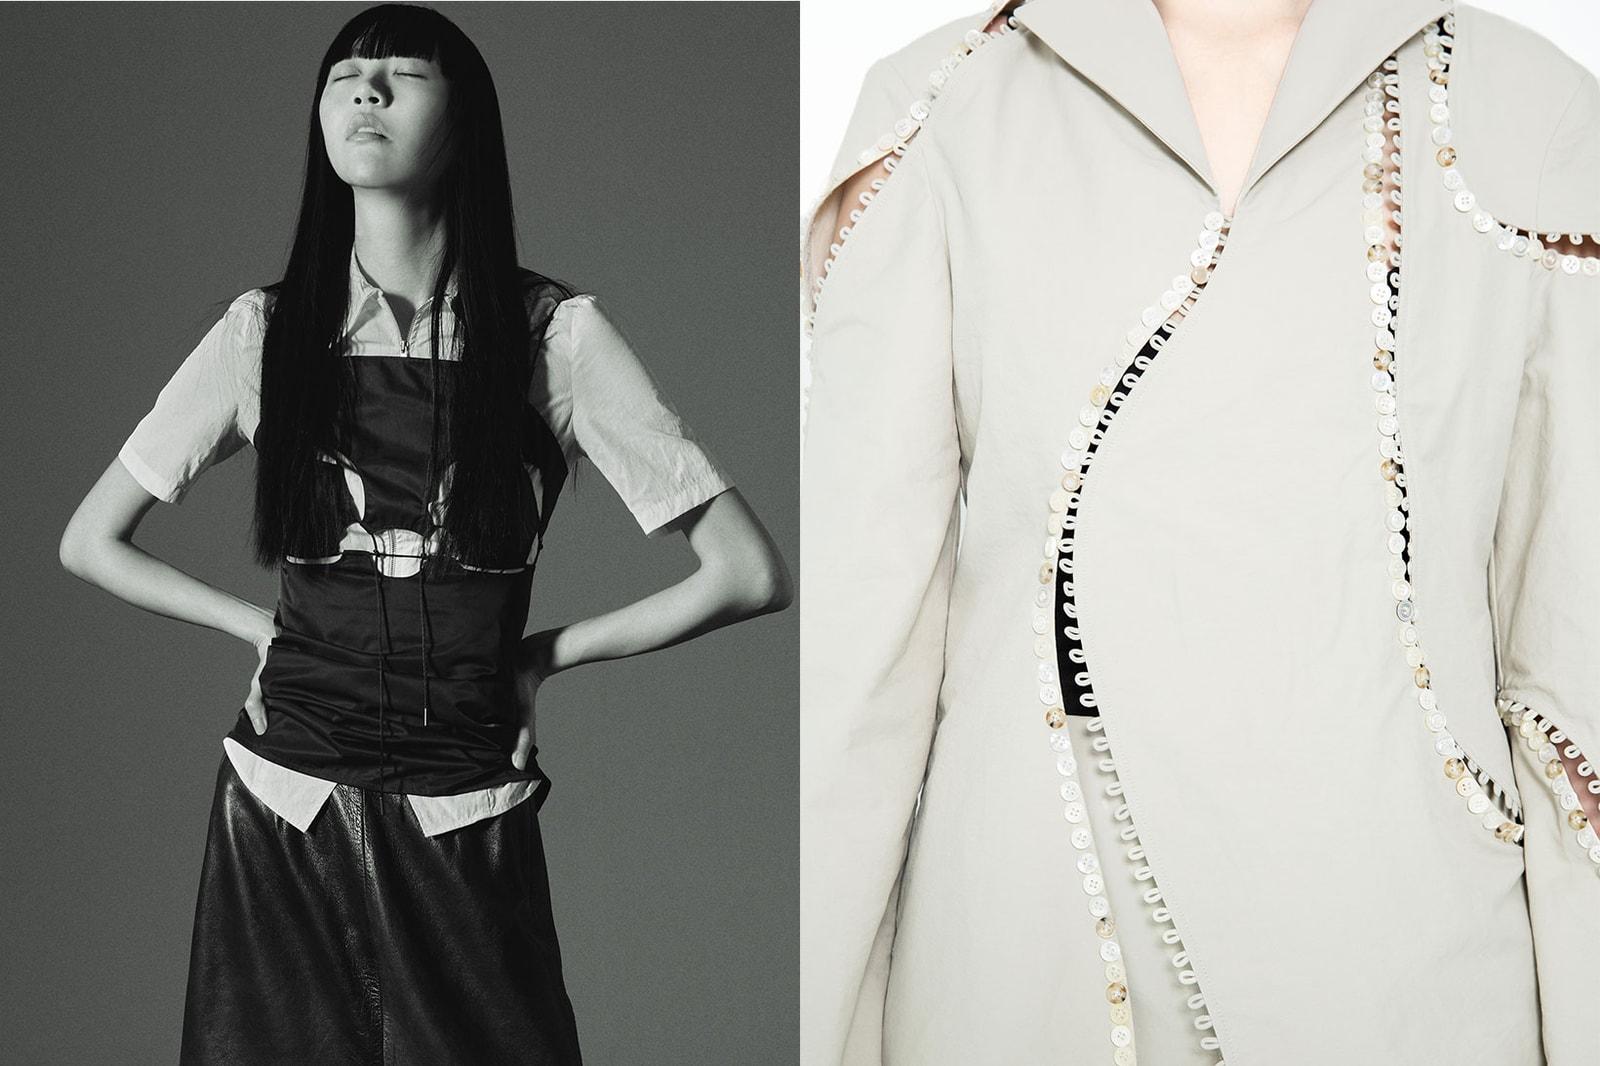 korean fashion emerging female fashion designers brands nibgnus details buttons black vest top